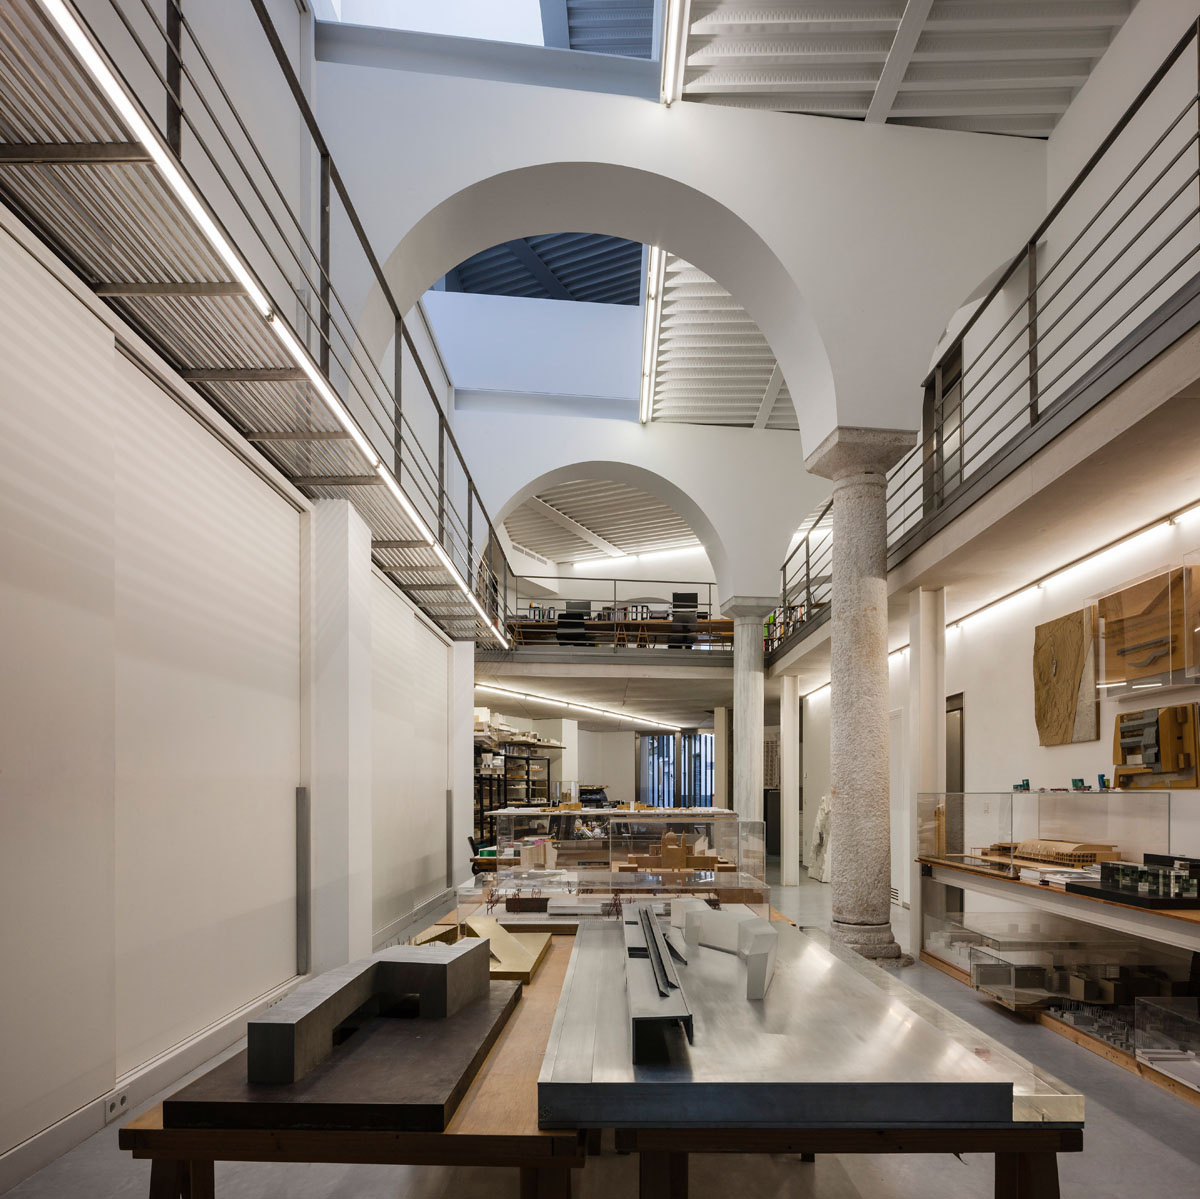 Estudio de arquitectura guillermo v zquez consuegra sevilla - Estudio de arquitectos ...